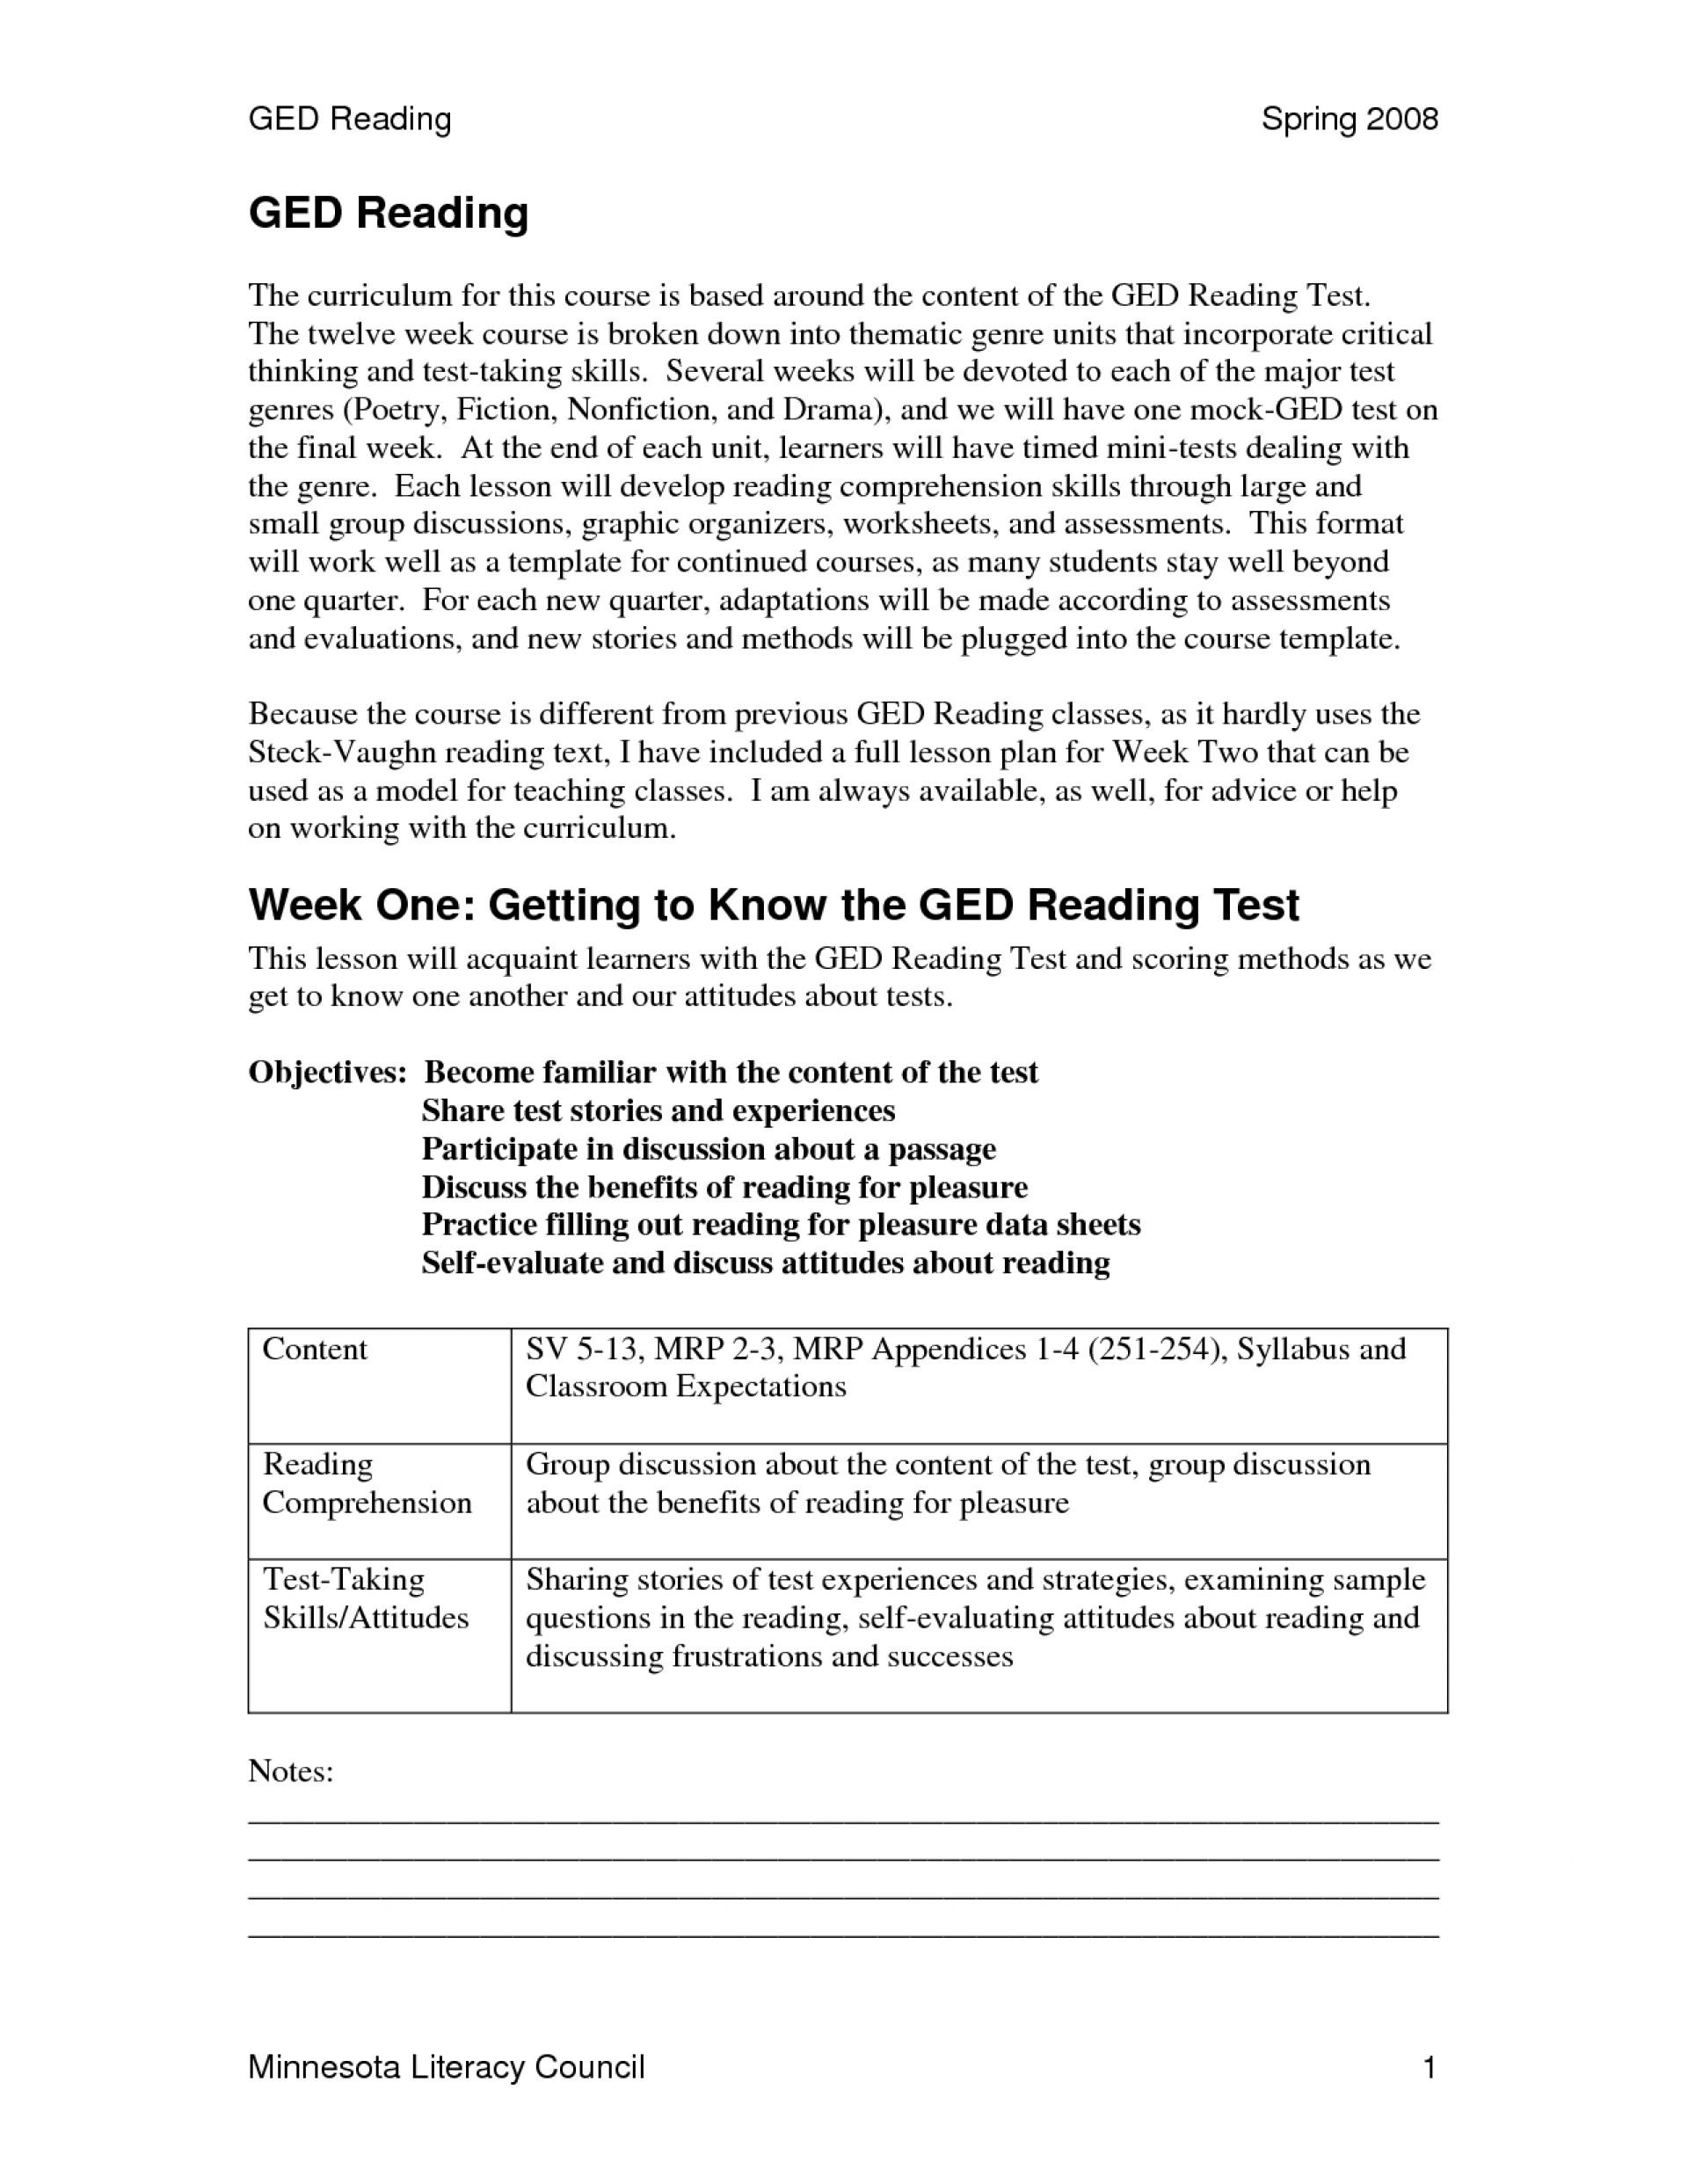 016 Essay Example Ged Practice Test Printable Worksheets 108850 How - Free Printable Ged Practice Test With Answer Key 2017